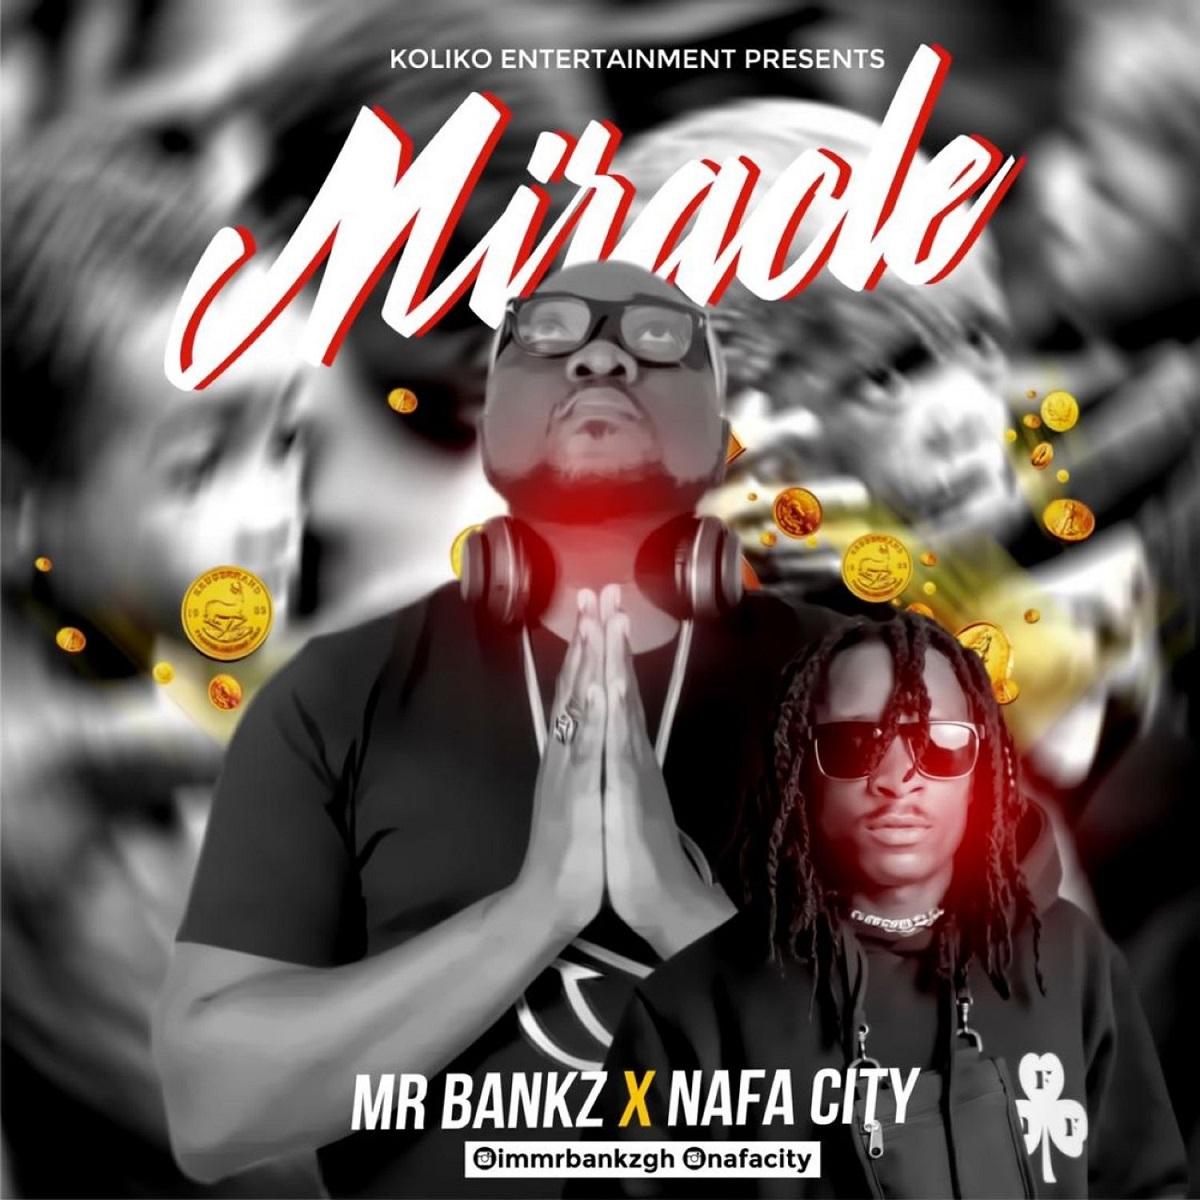 Miracle by Mr Bankz x Nafa City